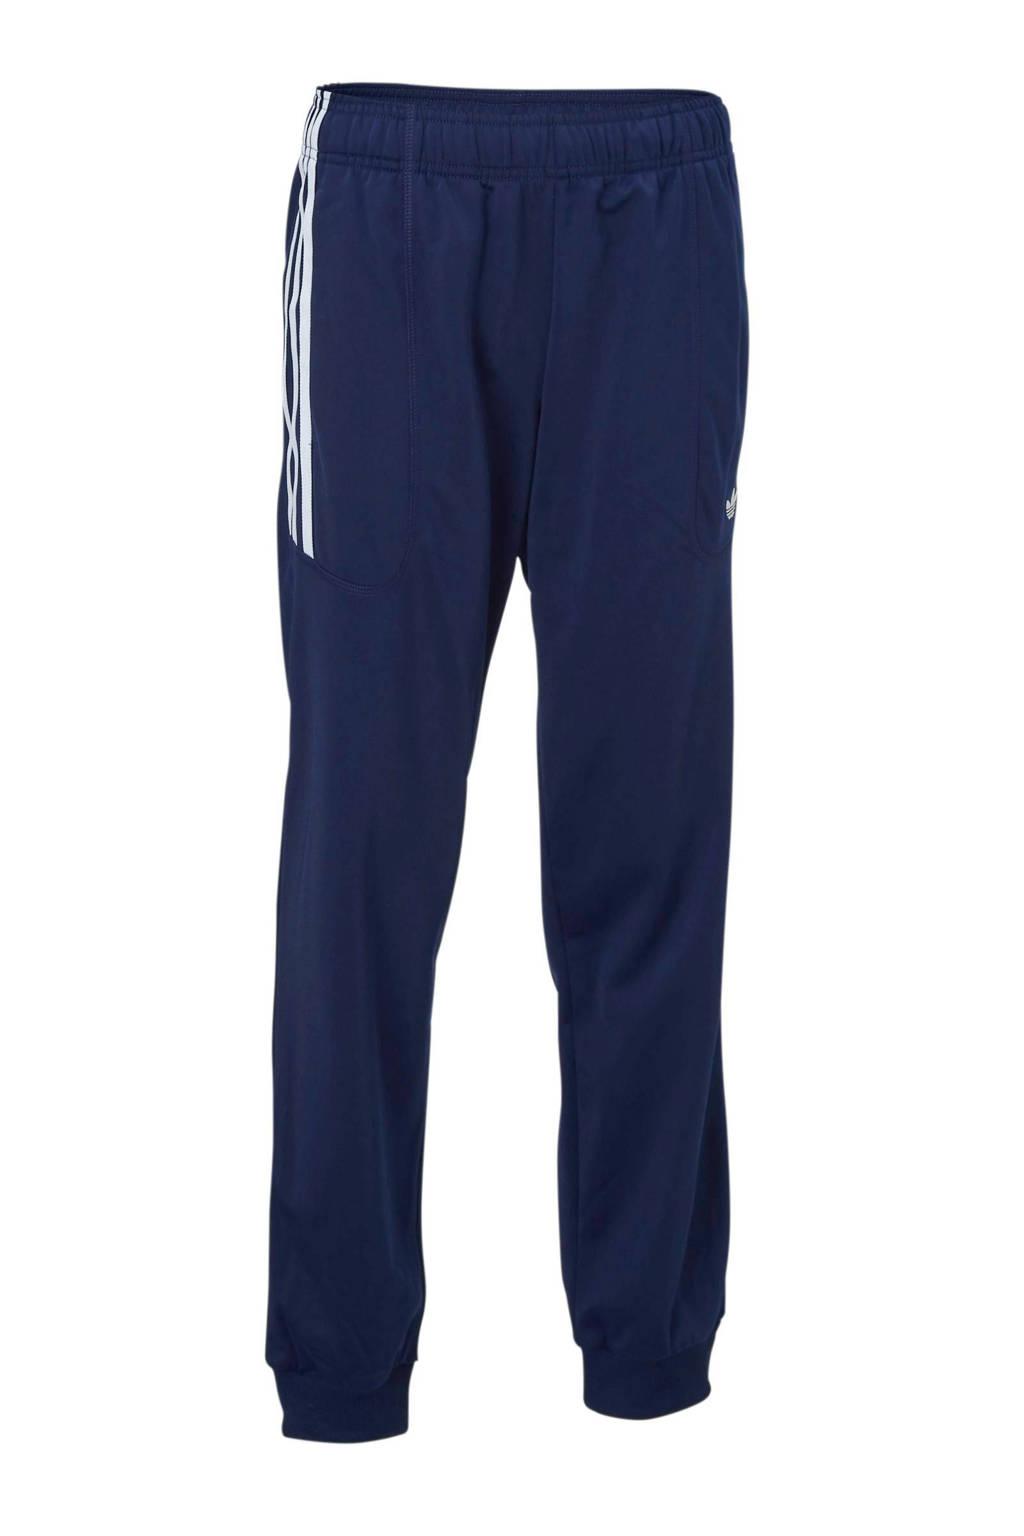 adidas originals   trainingsbroek donkerblauw, Donkerblauw